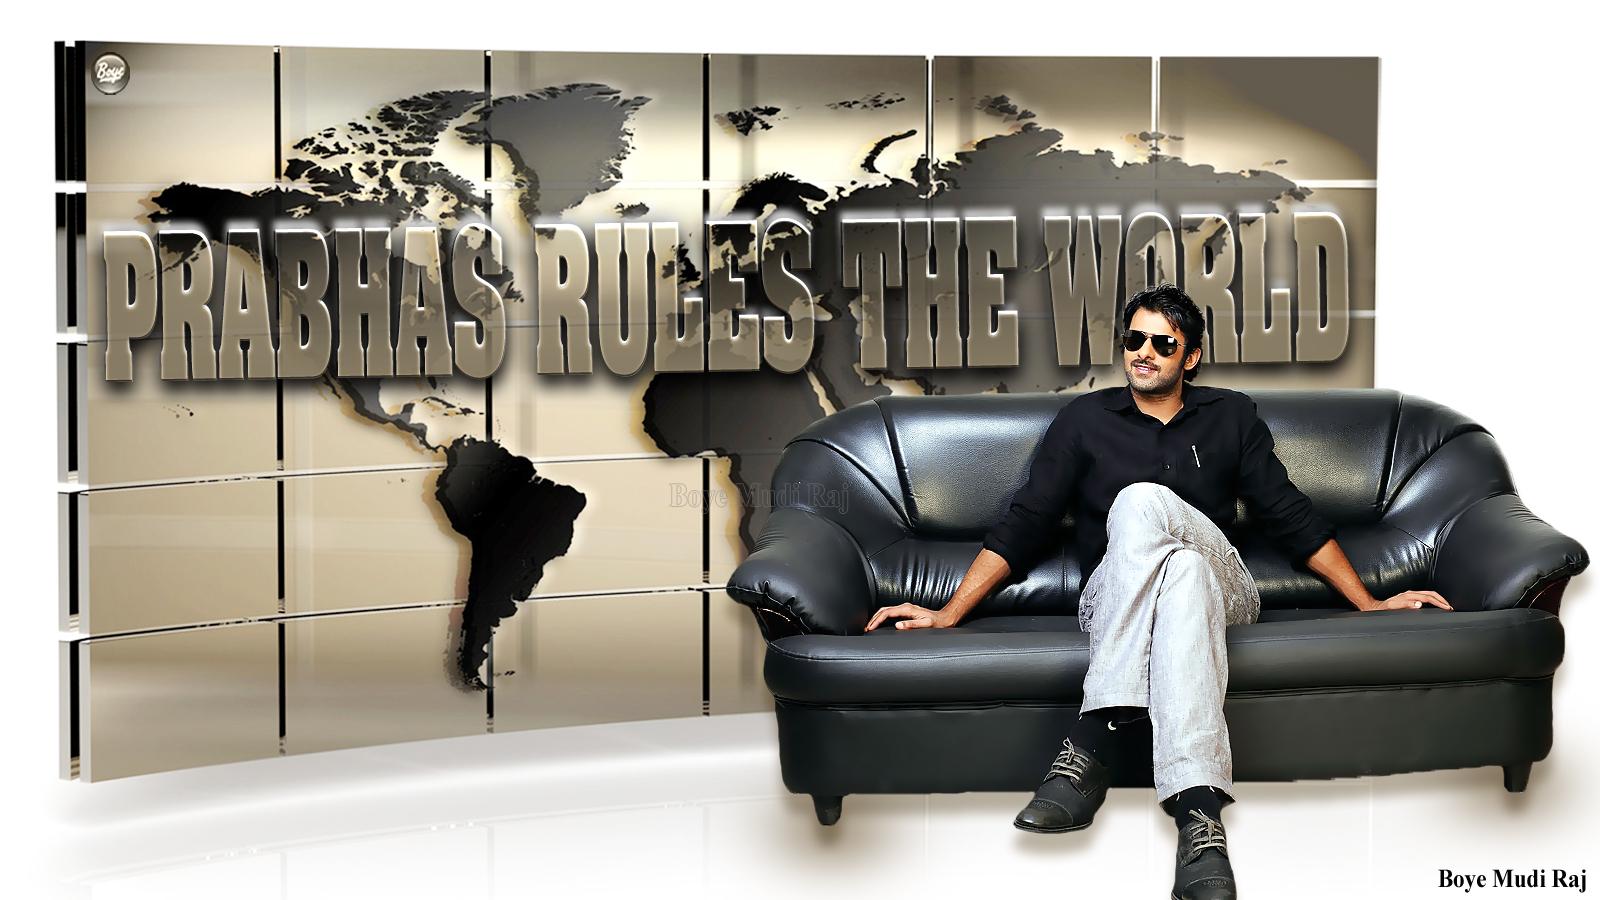 Boye Mudi Raj Hd Wallapapers 4 Photos: Prabhas Rules The World Design By Boye